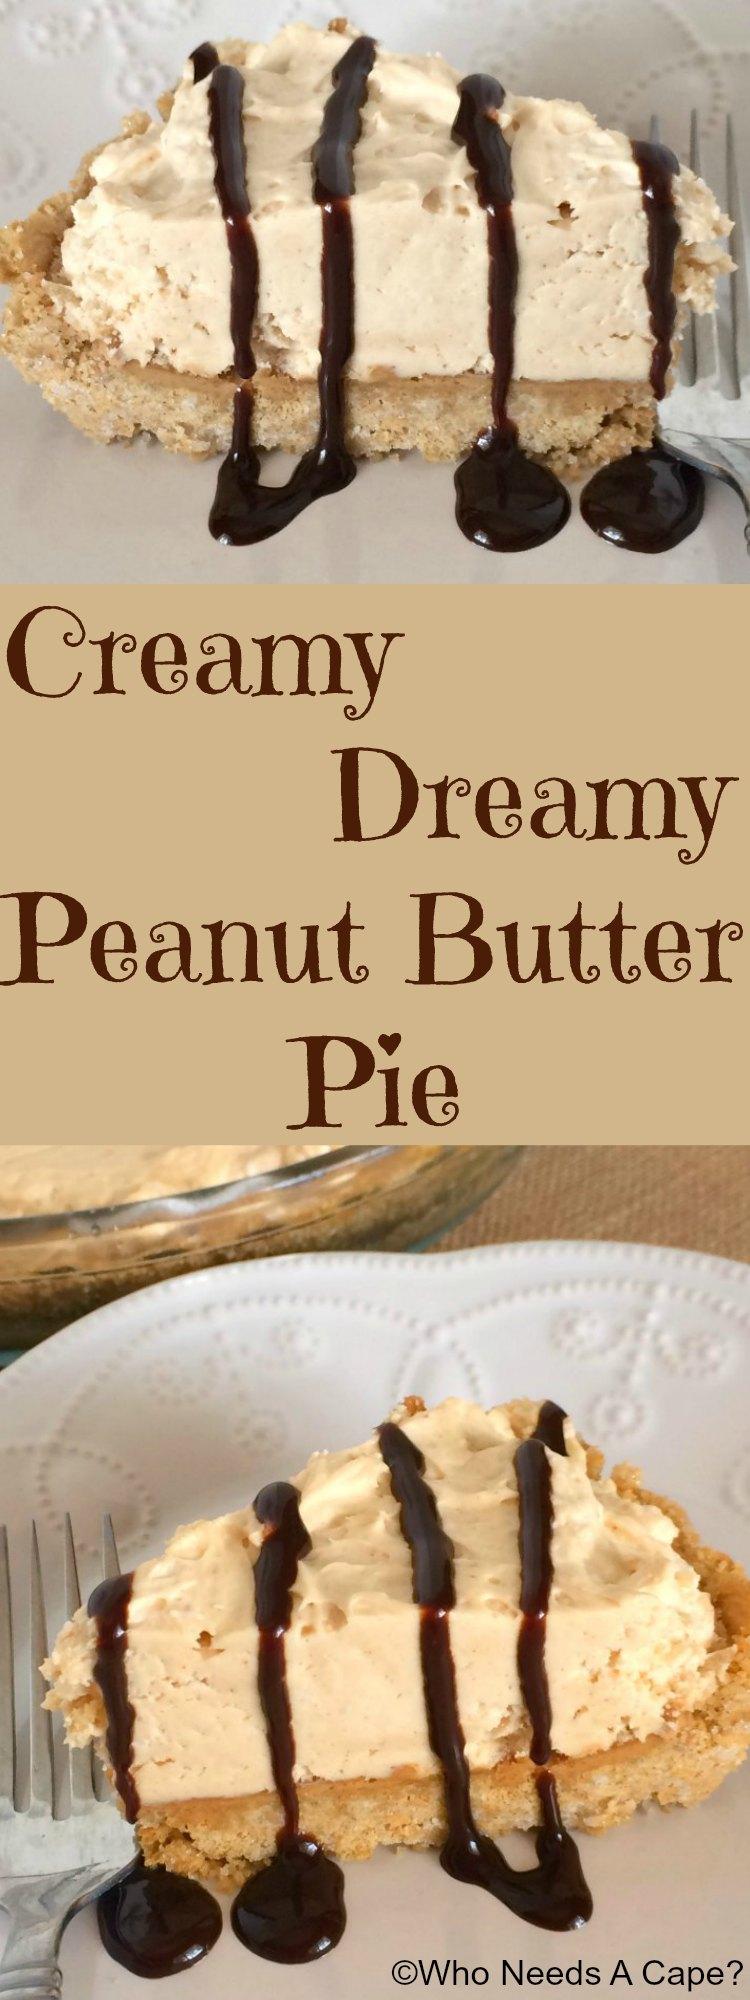 Creamy Peanut Butter Pie | Who Needs A Cape?